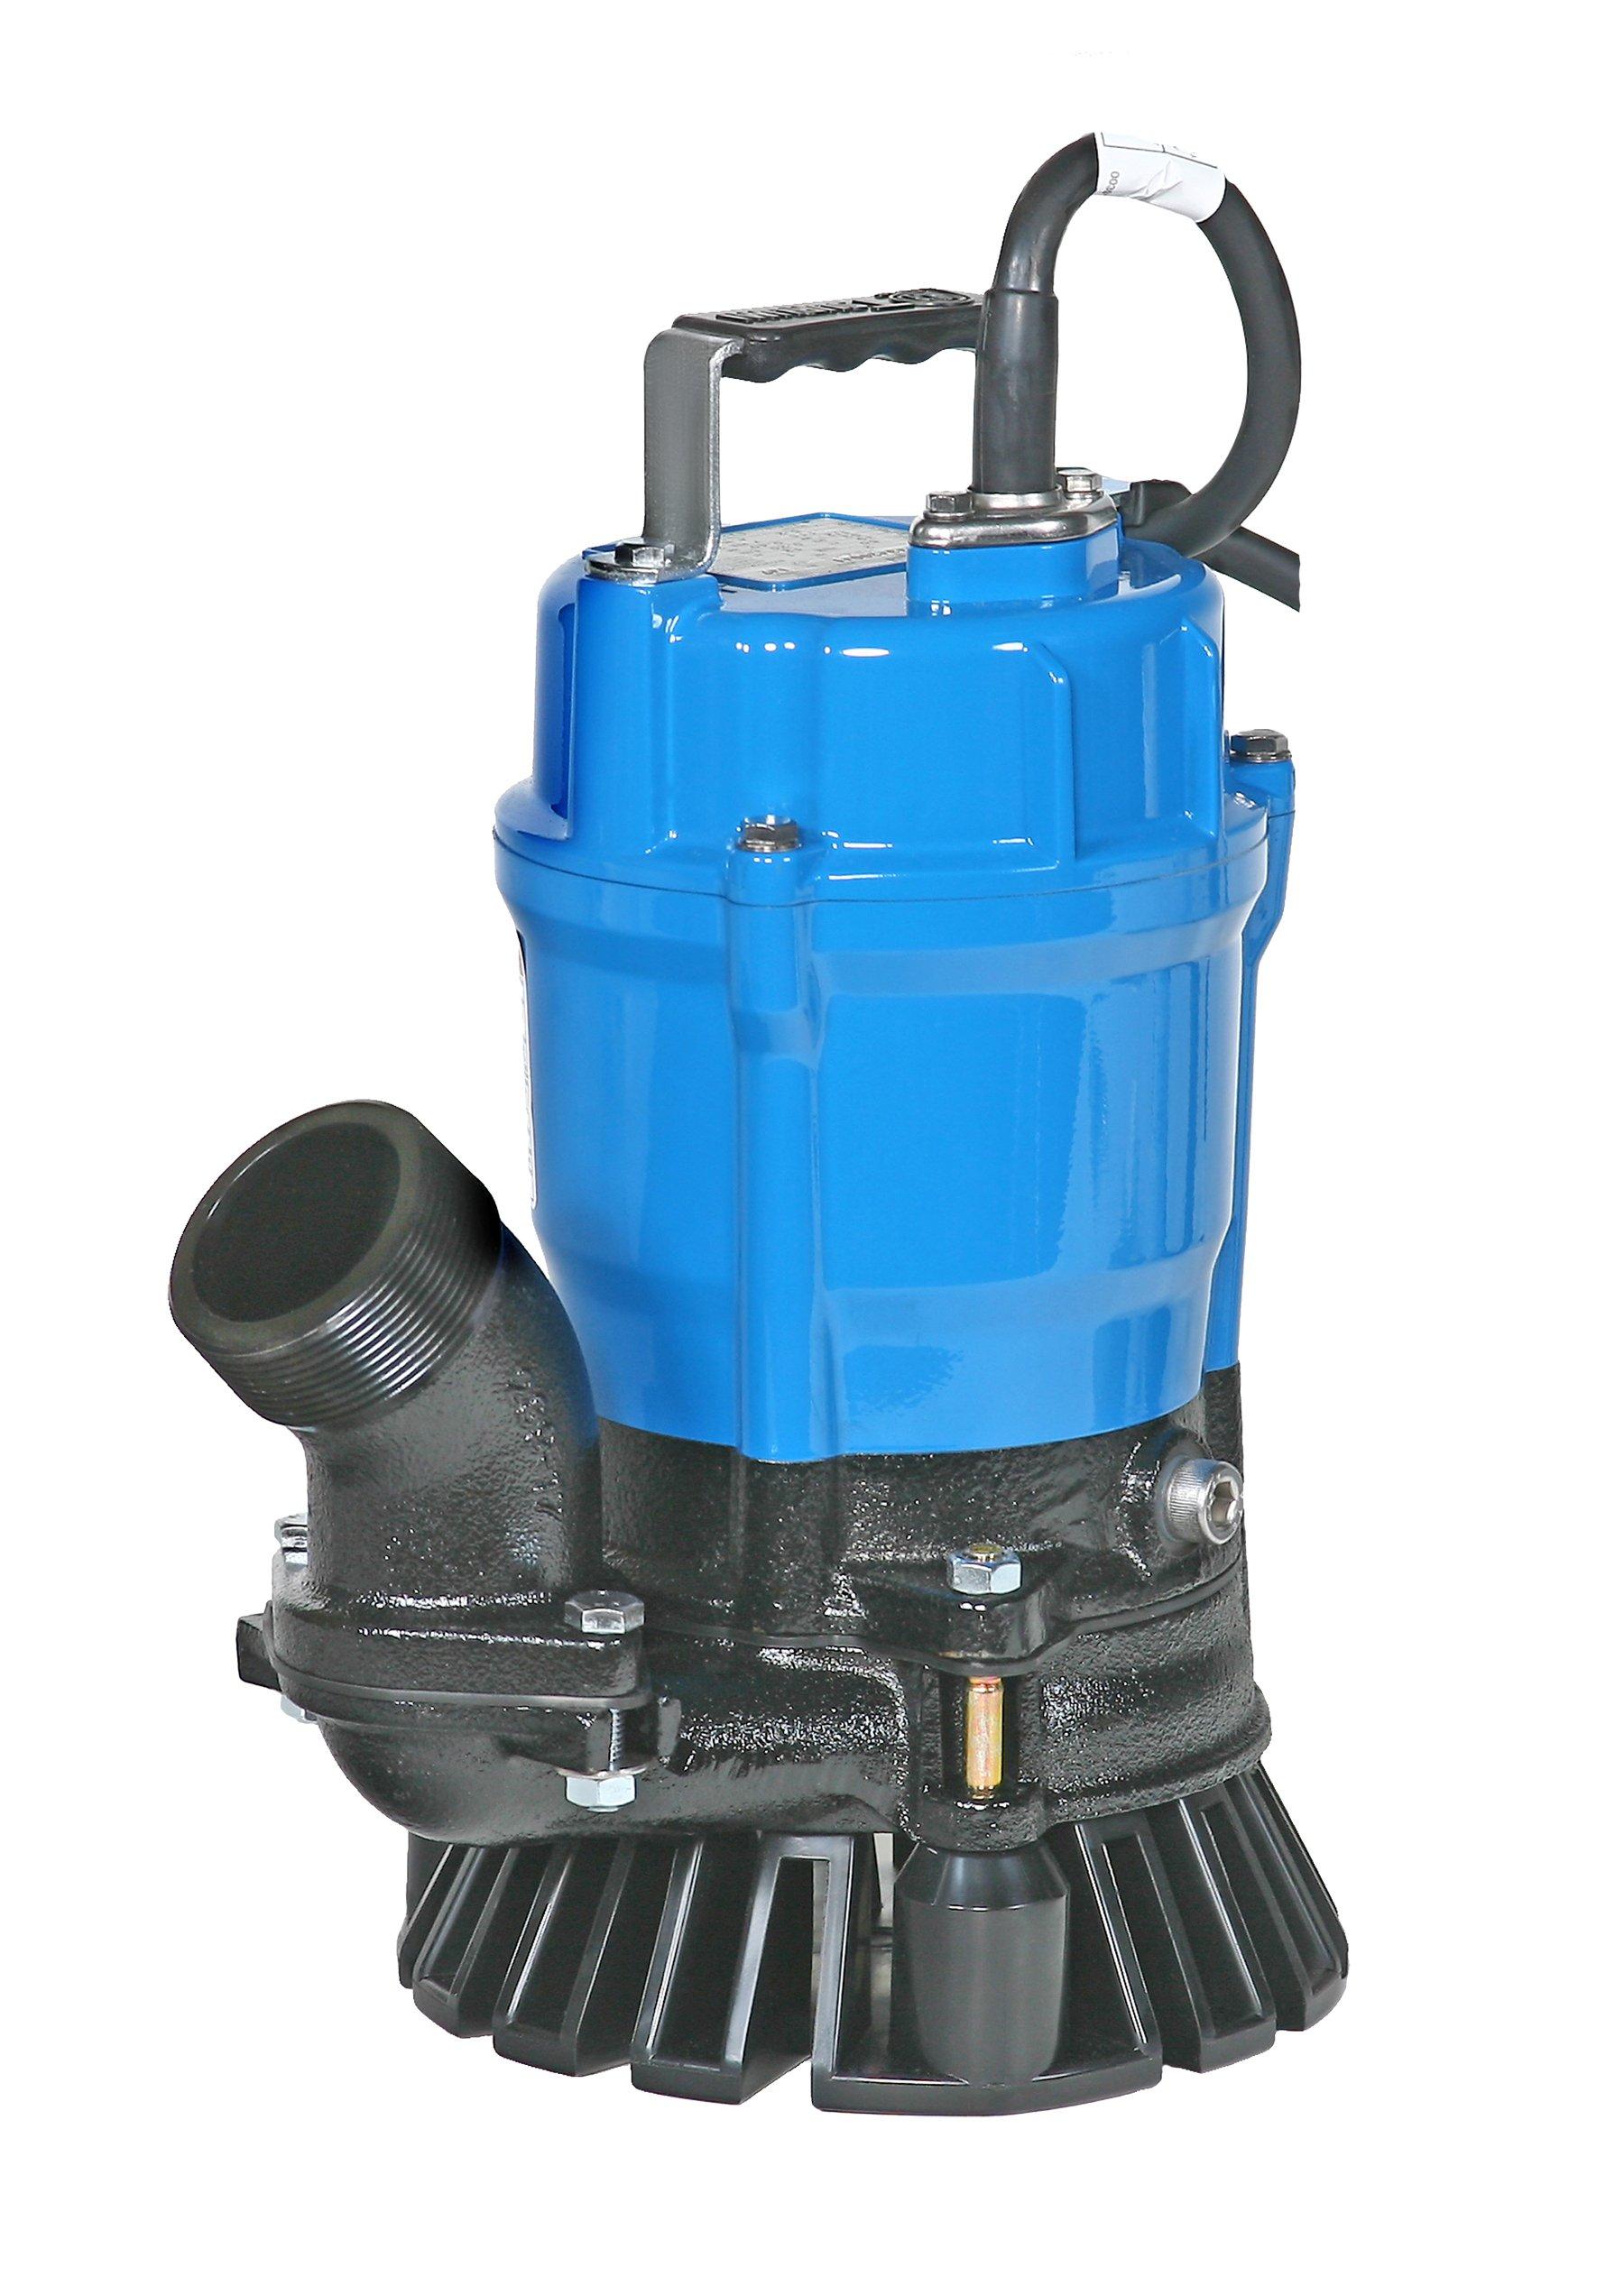 Tsurumi HS2.4S; semi-Vortex Submersible Trash Pump w/Agitator, 1/2hp, 115V, 2'' Discharge by Tsurumi